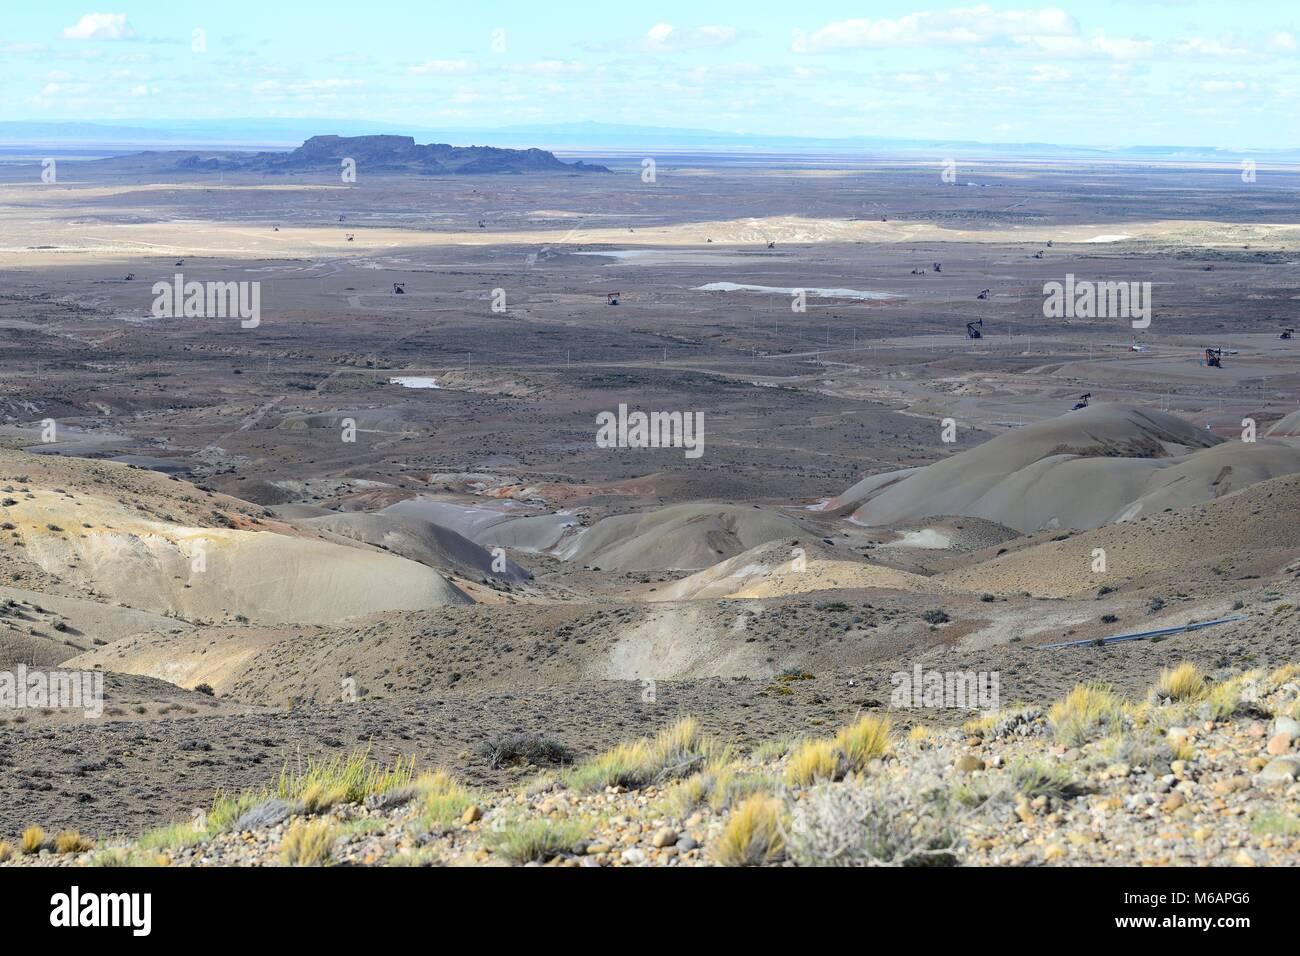 Crude oil production at Punto El Chulengo, Ruta 26, Comodoro Rivadavia, Chubut, Argentina - Stock Image